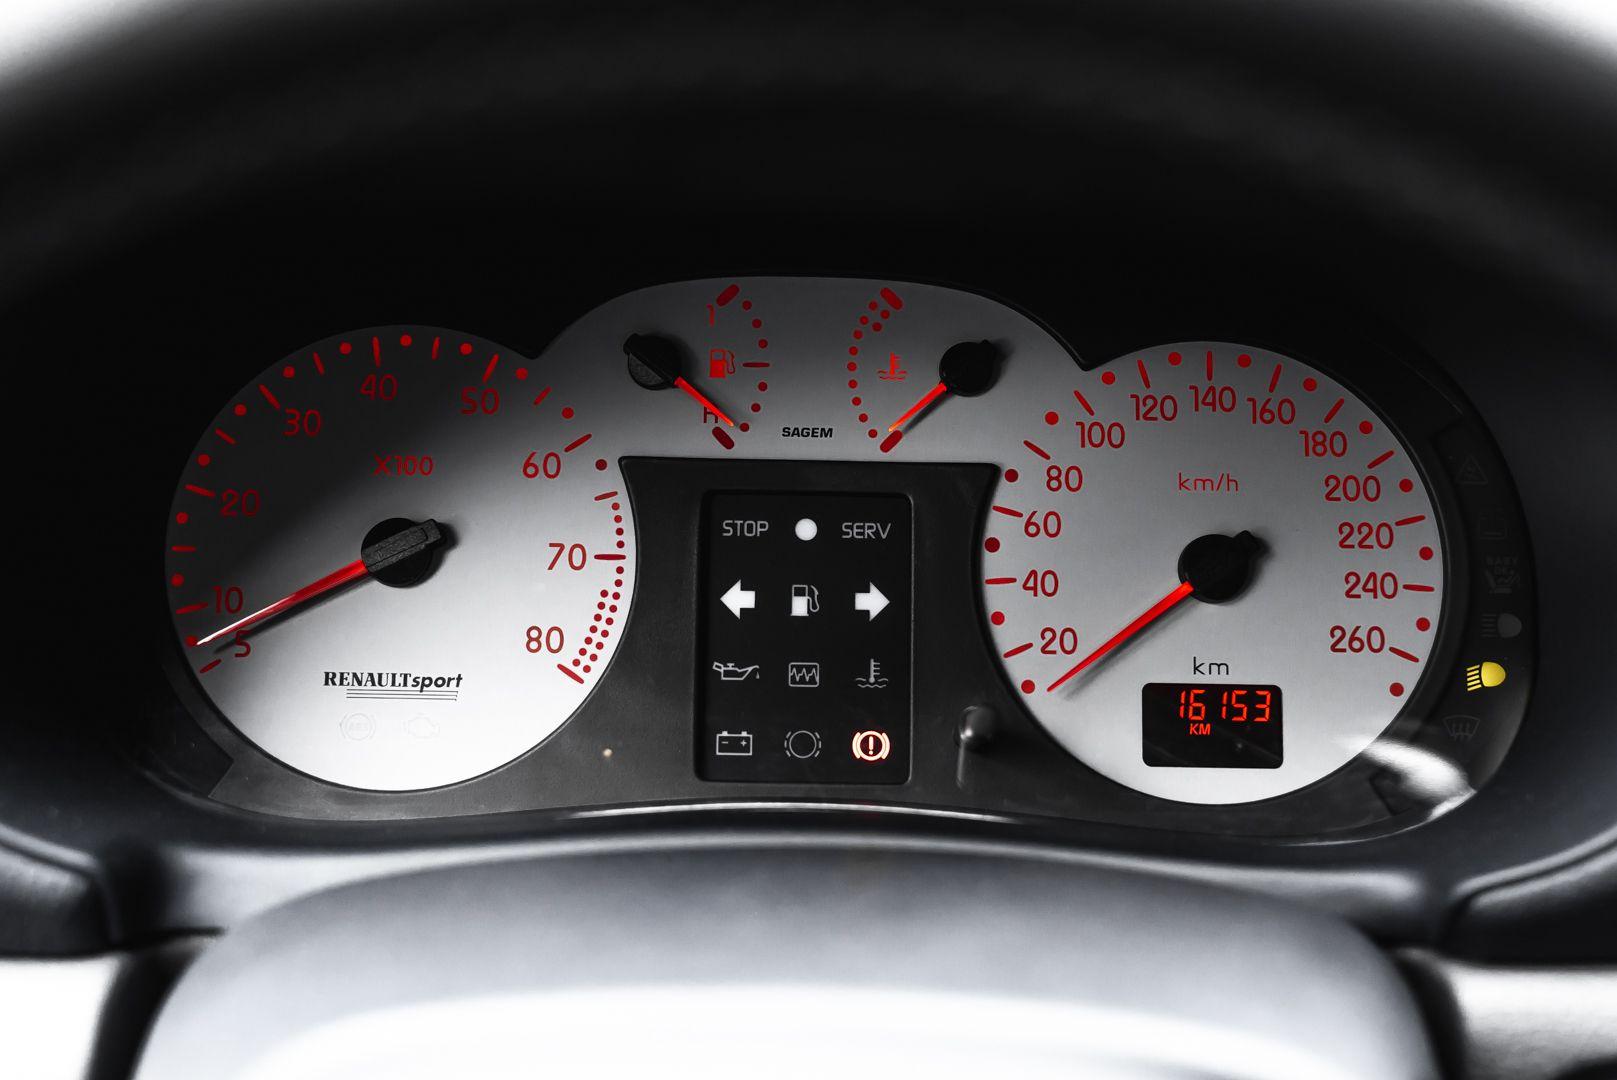 2002 Renault Clio 3.0 V6 Renault Sport Phase1 84947